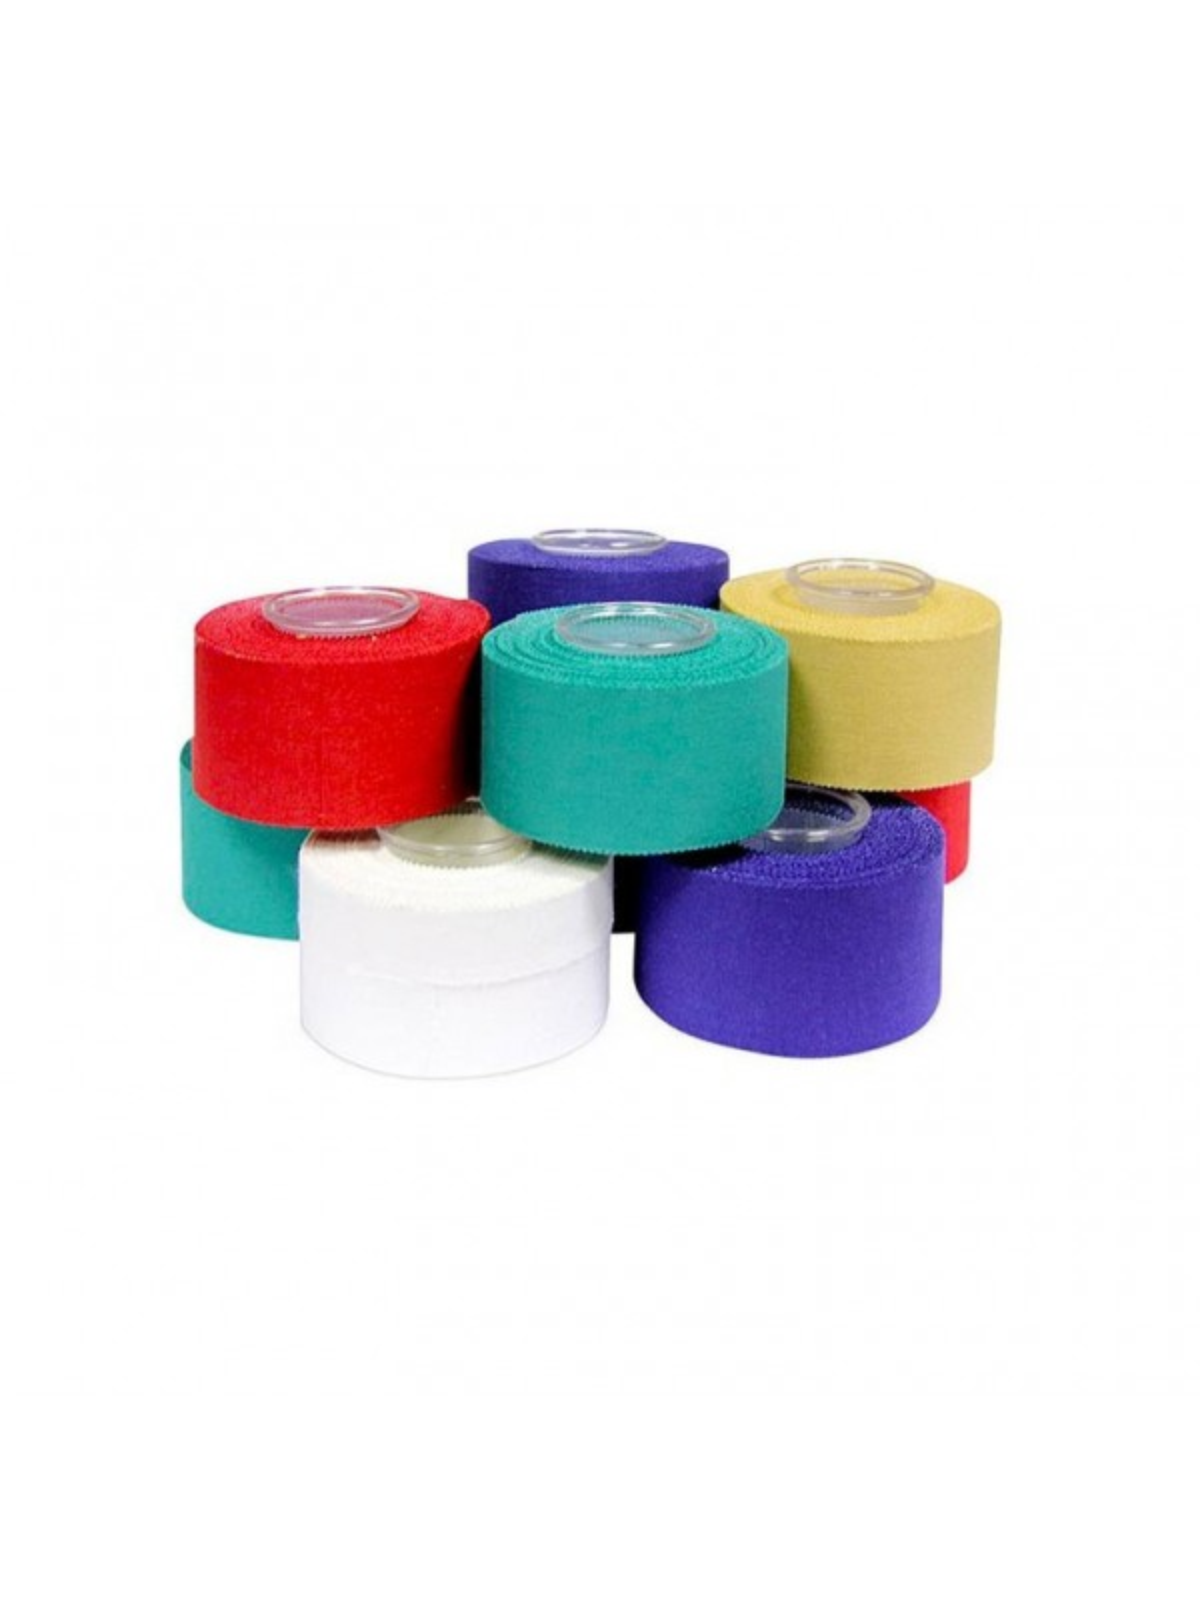 Artroben Tape